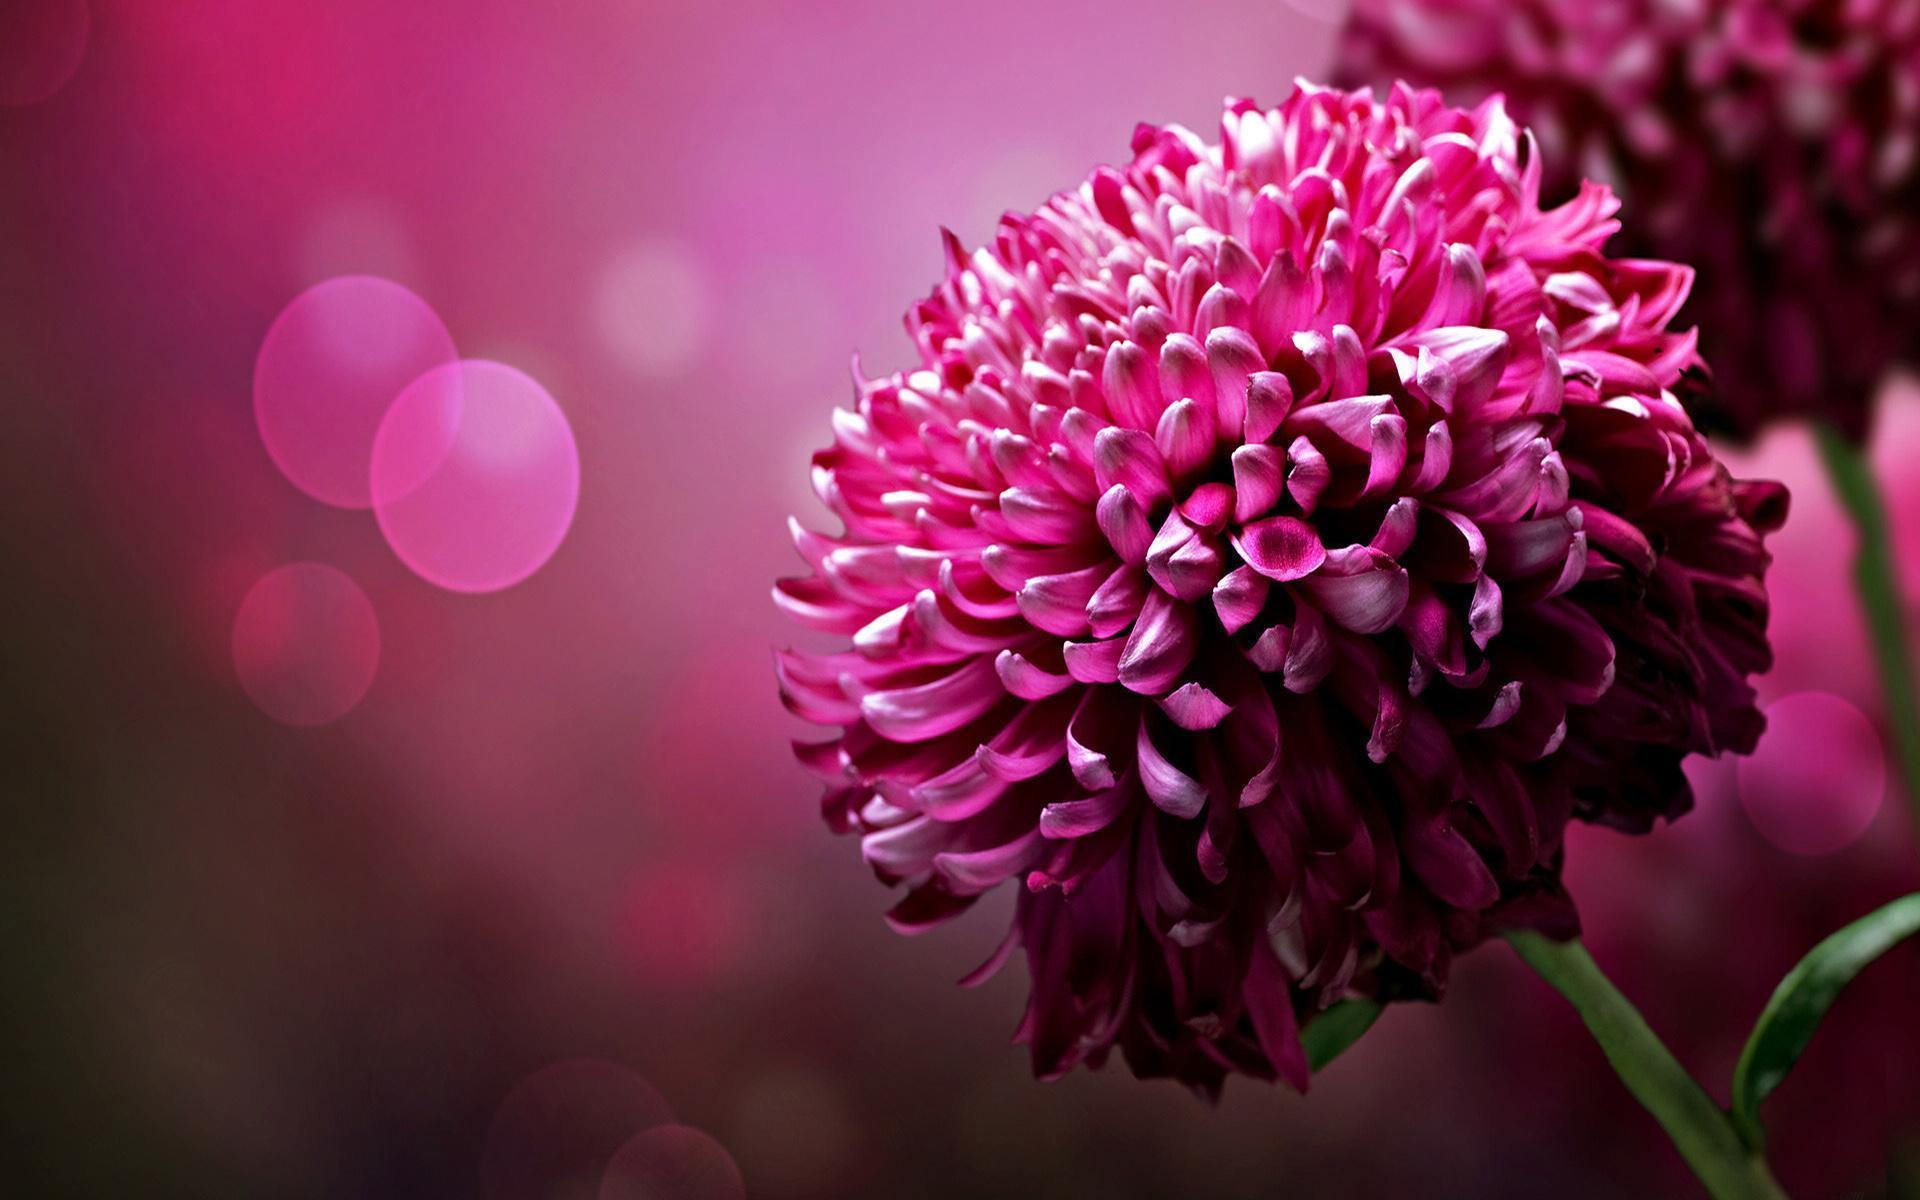 Flowers Images Desktop Backgrounds Wallpaper Cave